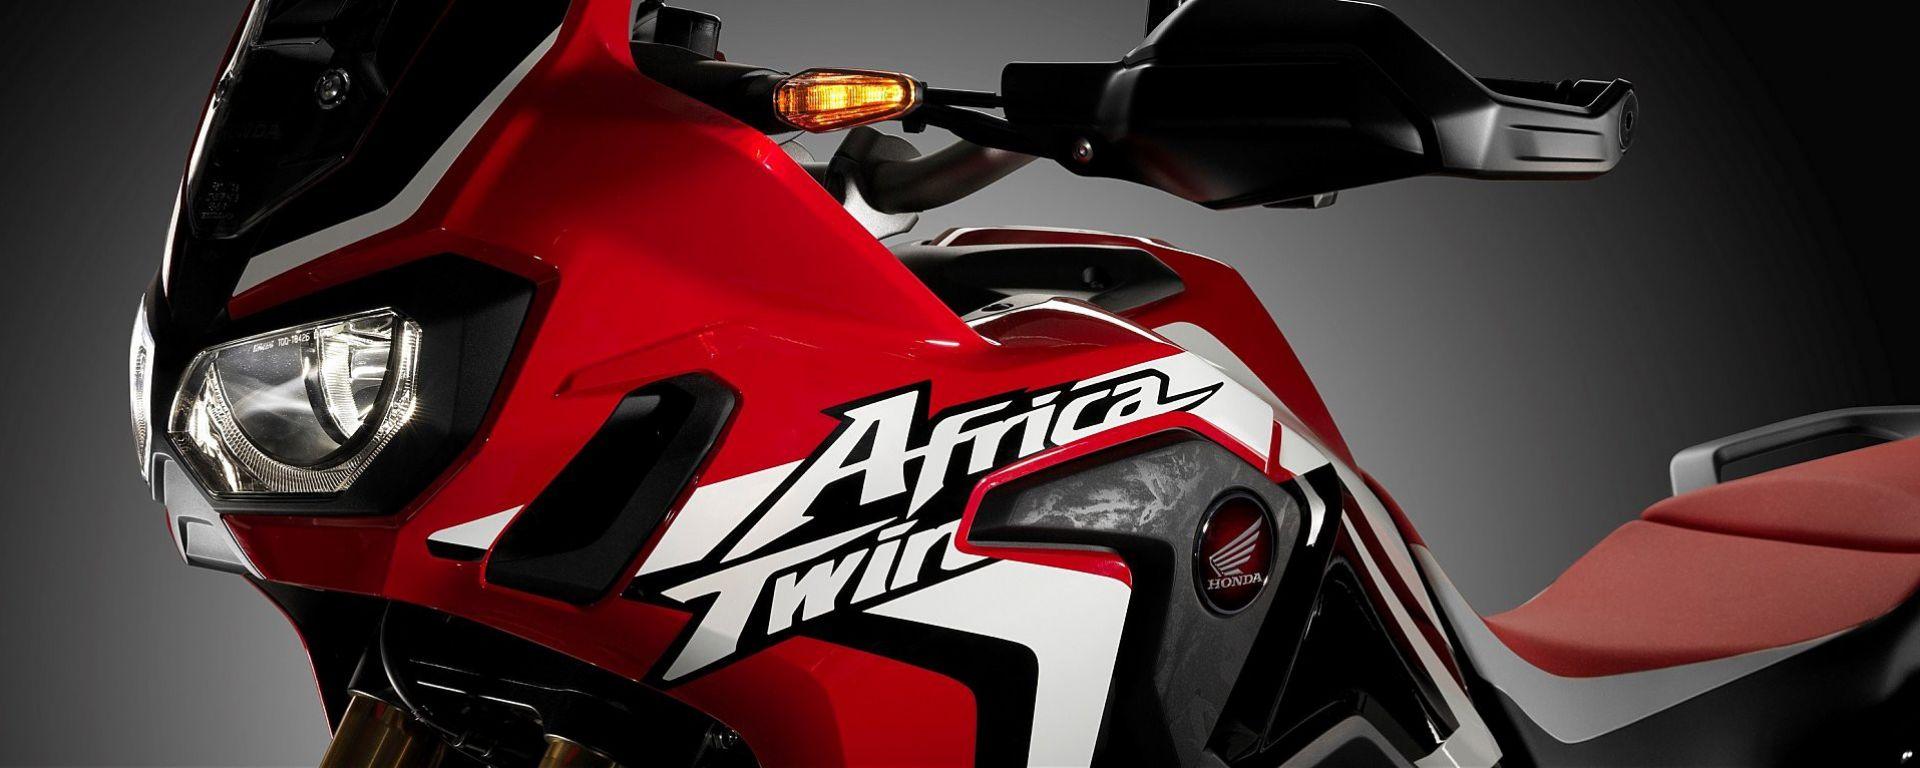 Honda CRF1000L Africa Twin, nuove immagini e info